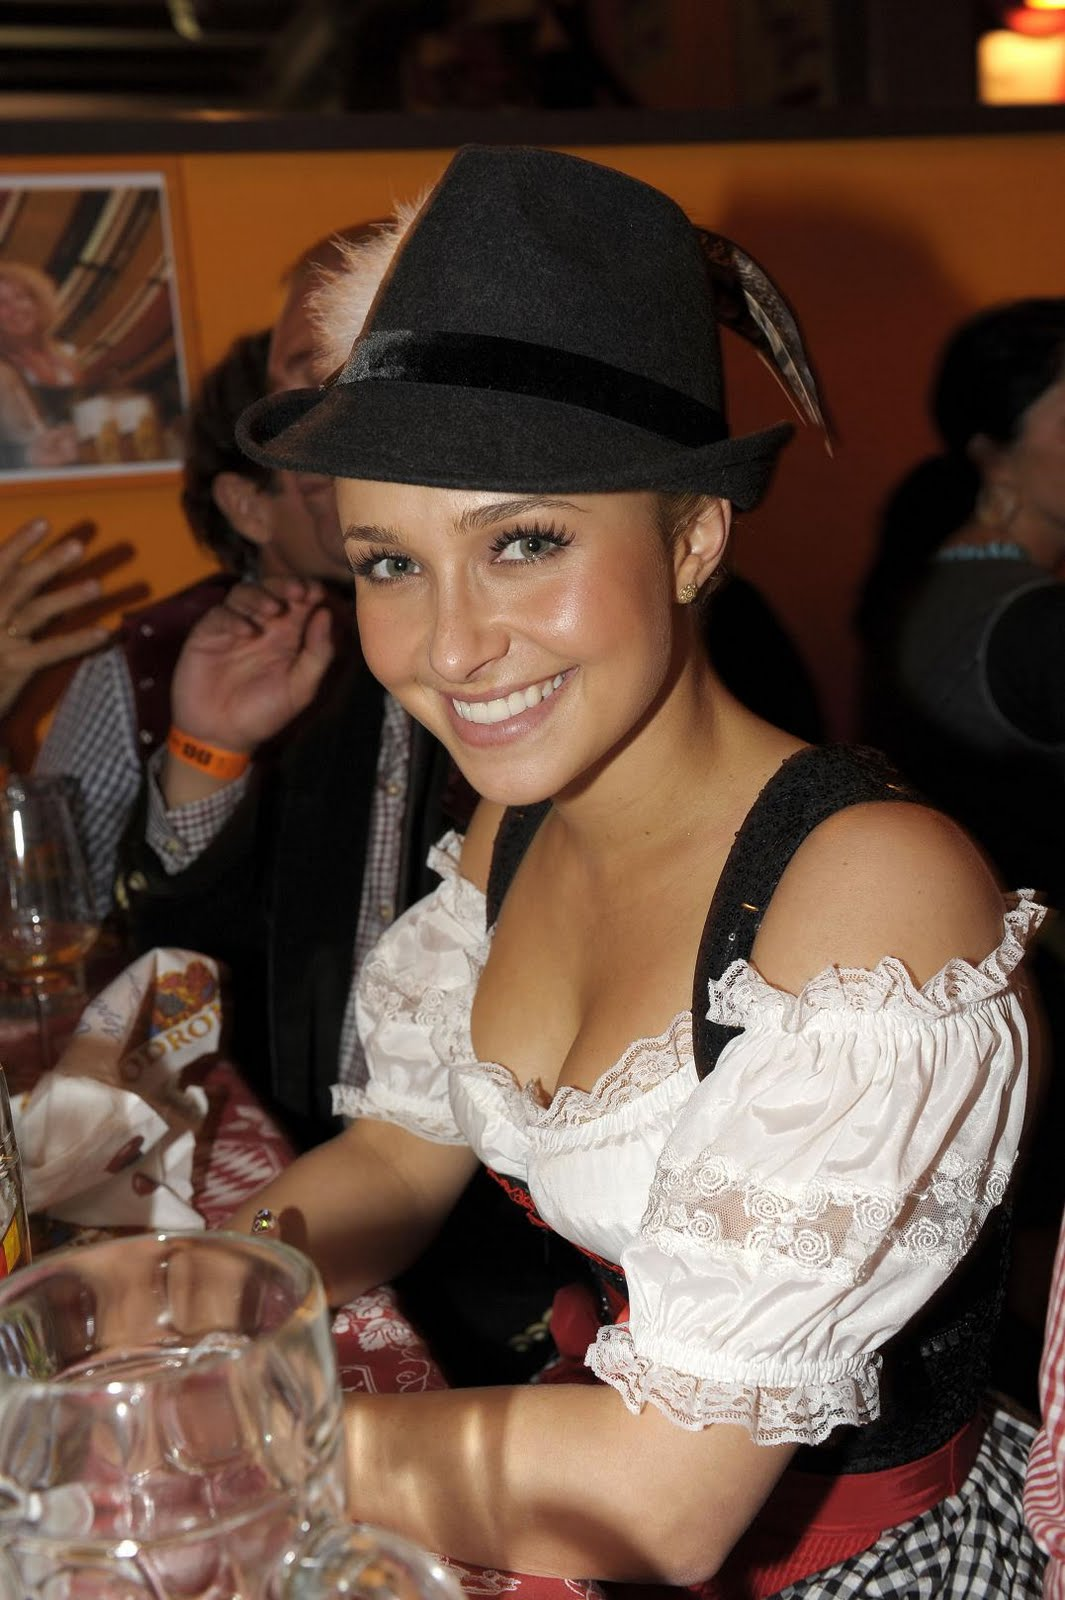 http://1.bp.blogspot.com/_otYSffaXp0Q/TKIrlL0IKmI/AAAAAAAAVPc/lI71BLfUoVA/s1600/hayden_panettiere_oktoberfest_munich_sept_25_2010_eDFq.JPG